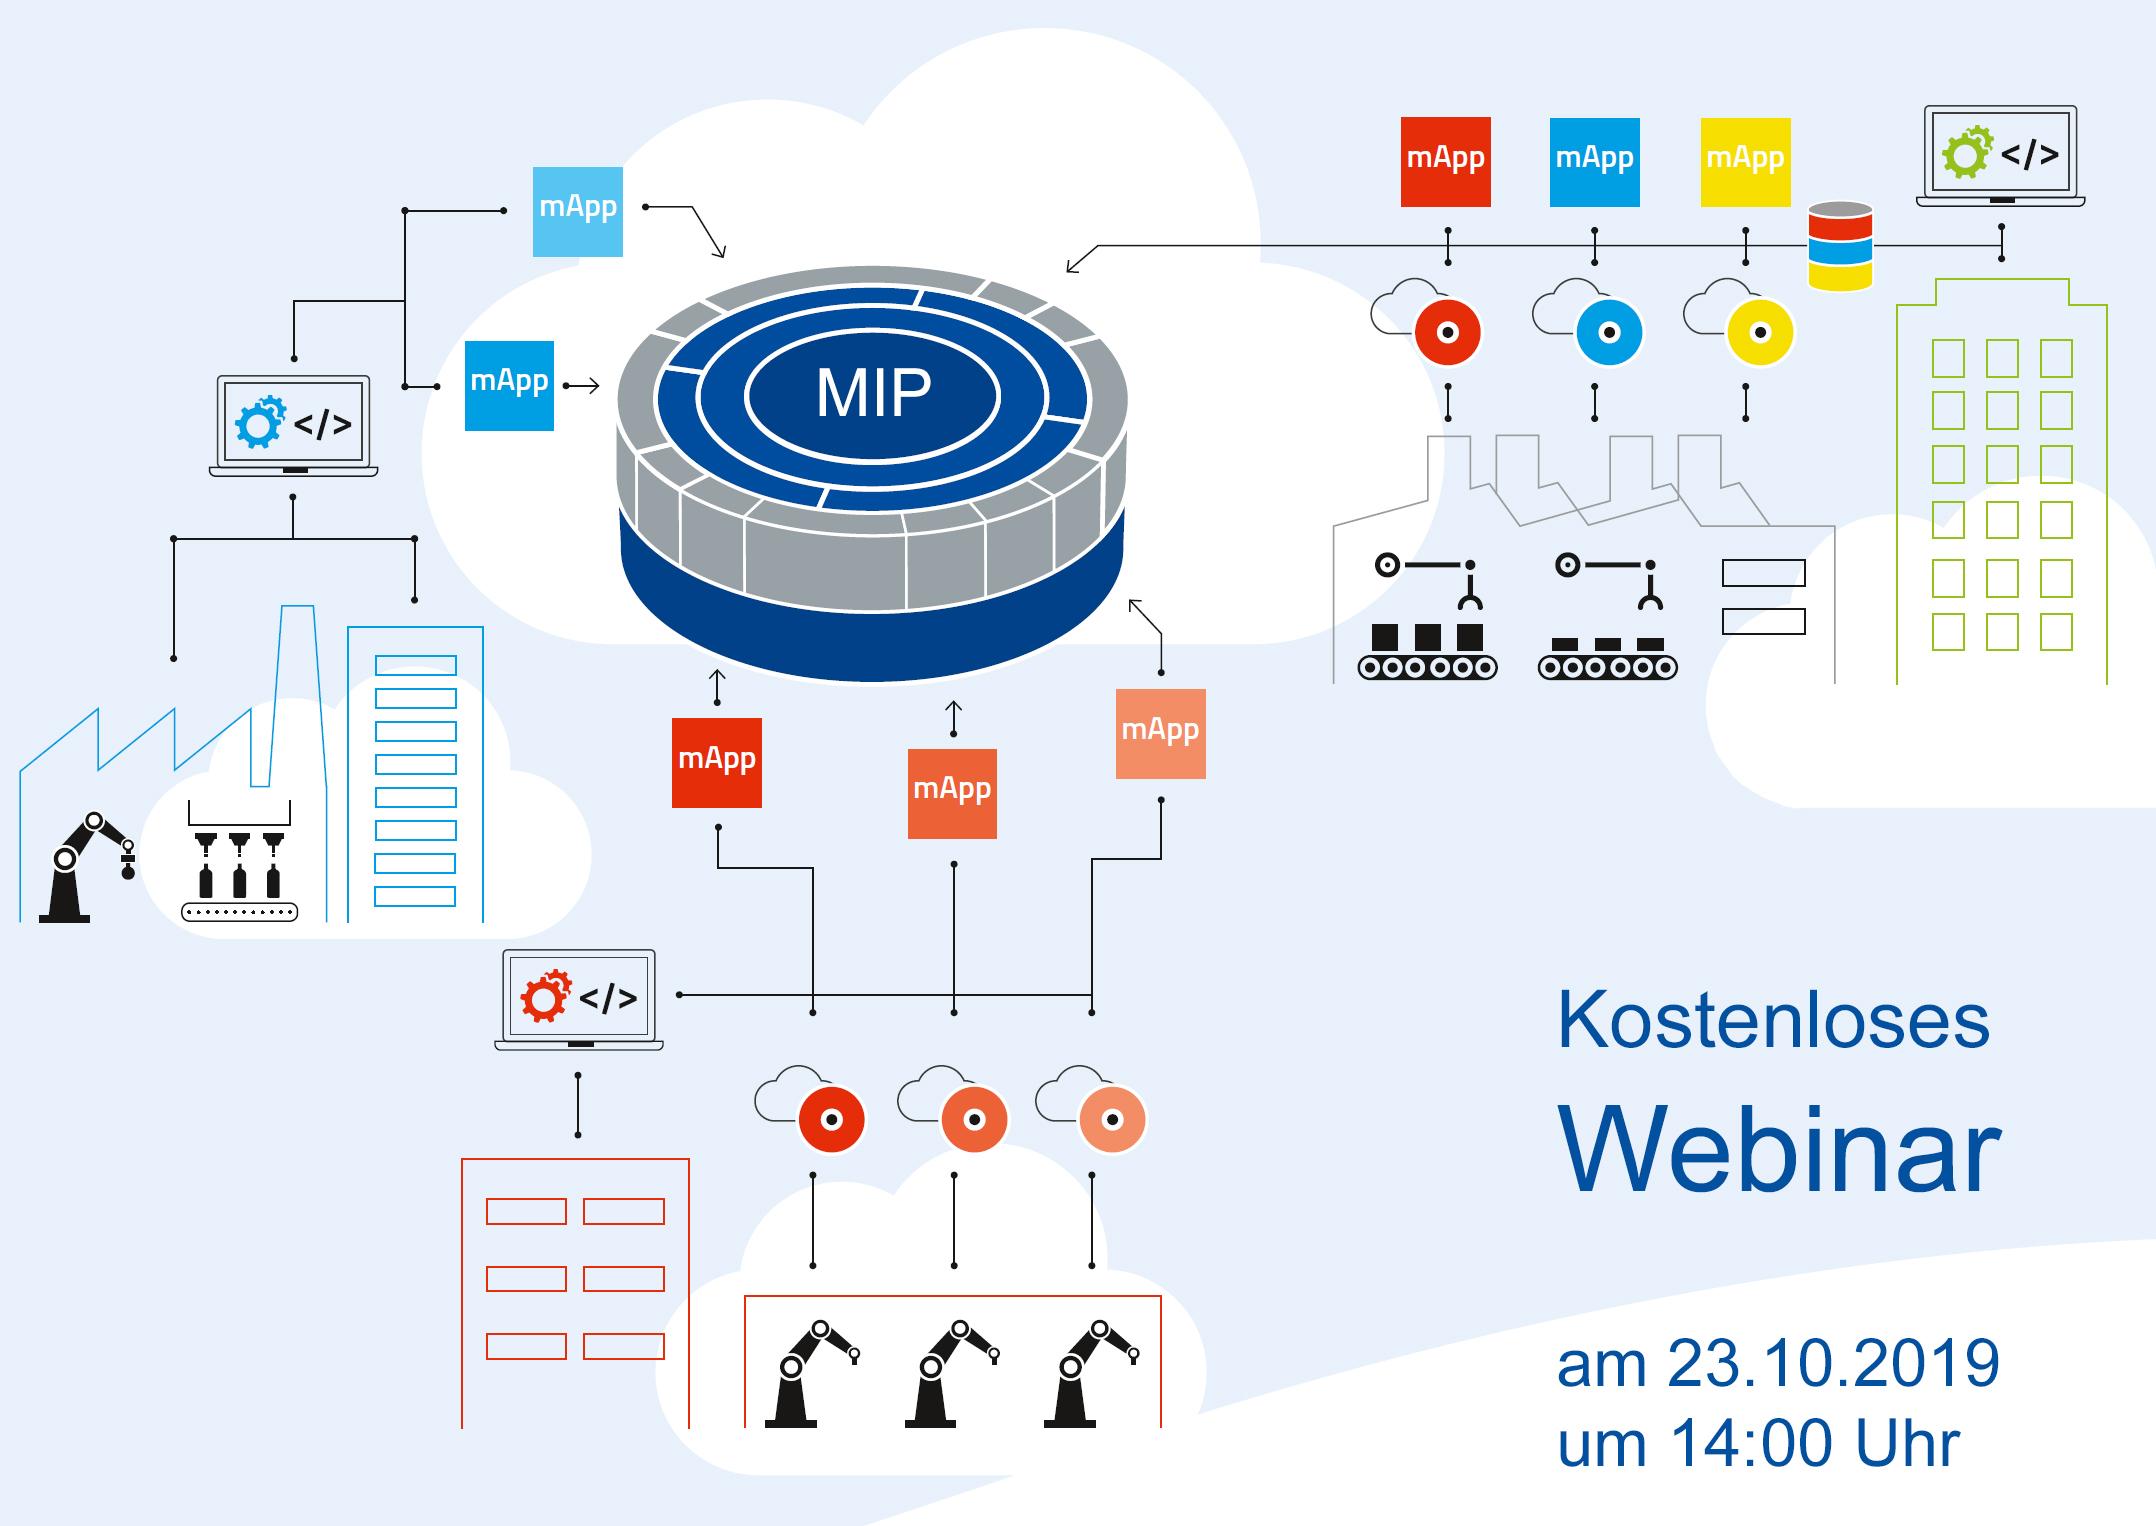 Webinar zum MIP-Ökosystem am 23.10.2019 um 14:00 Uhr (Bild: MPDV)